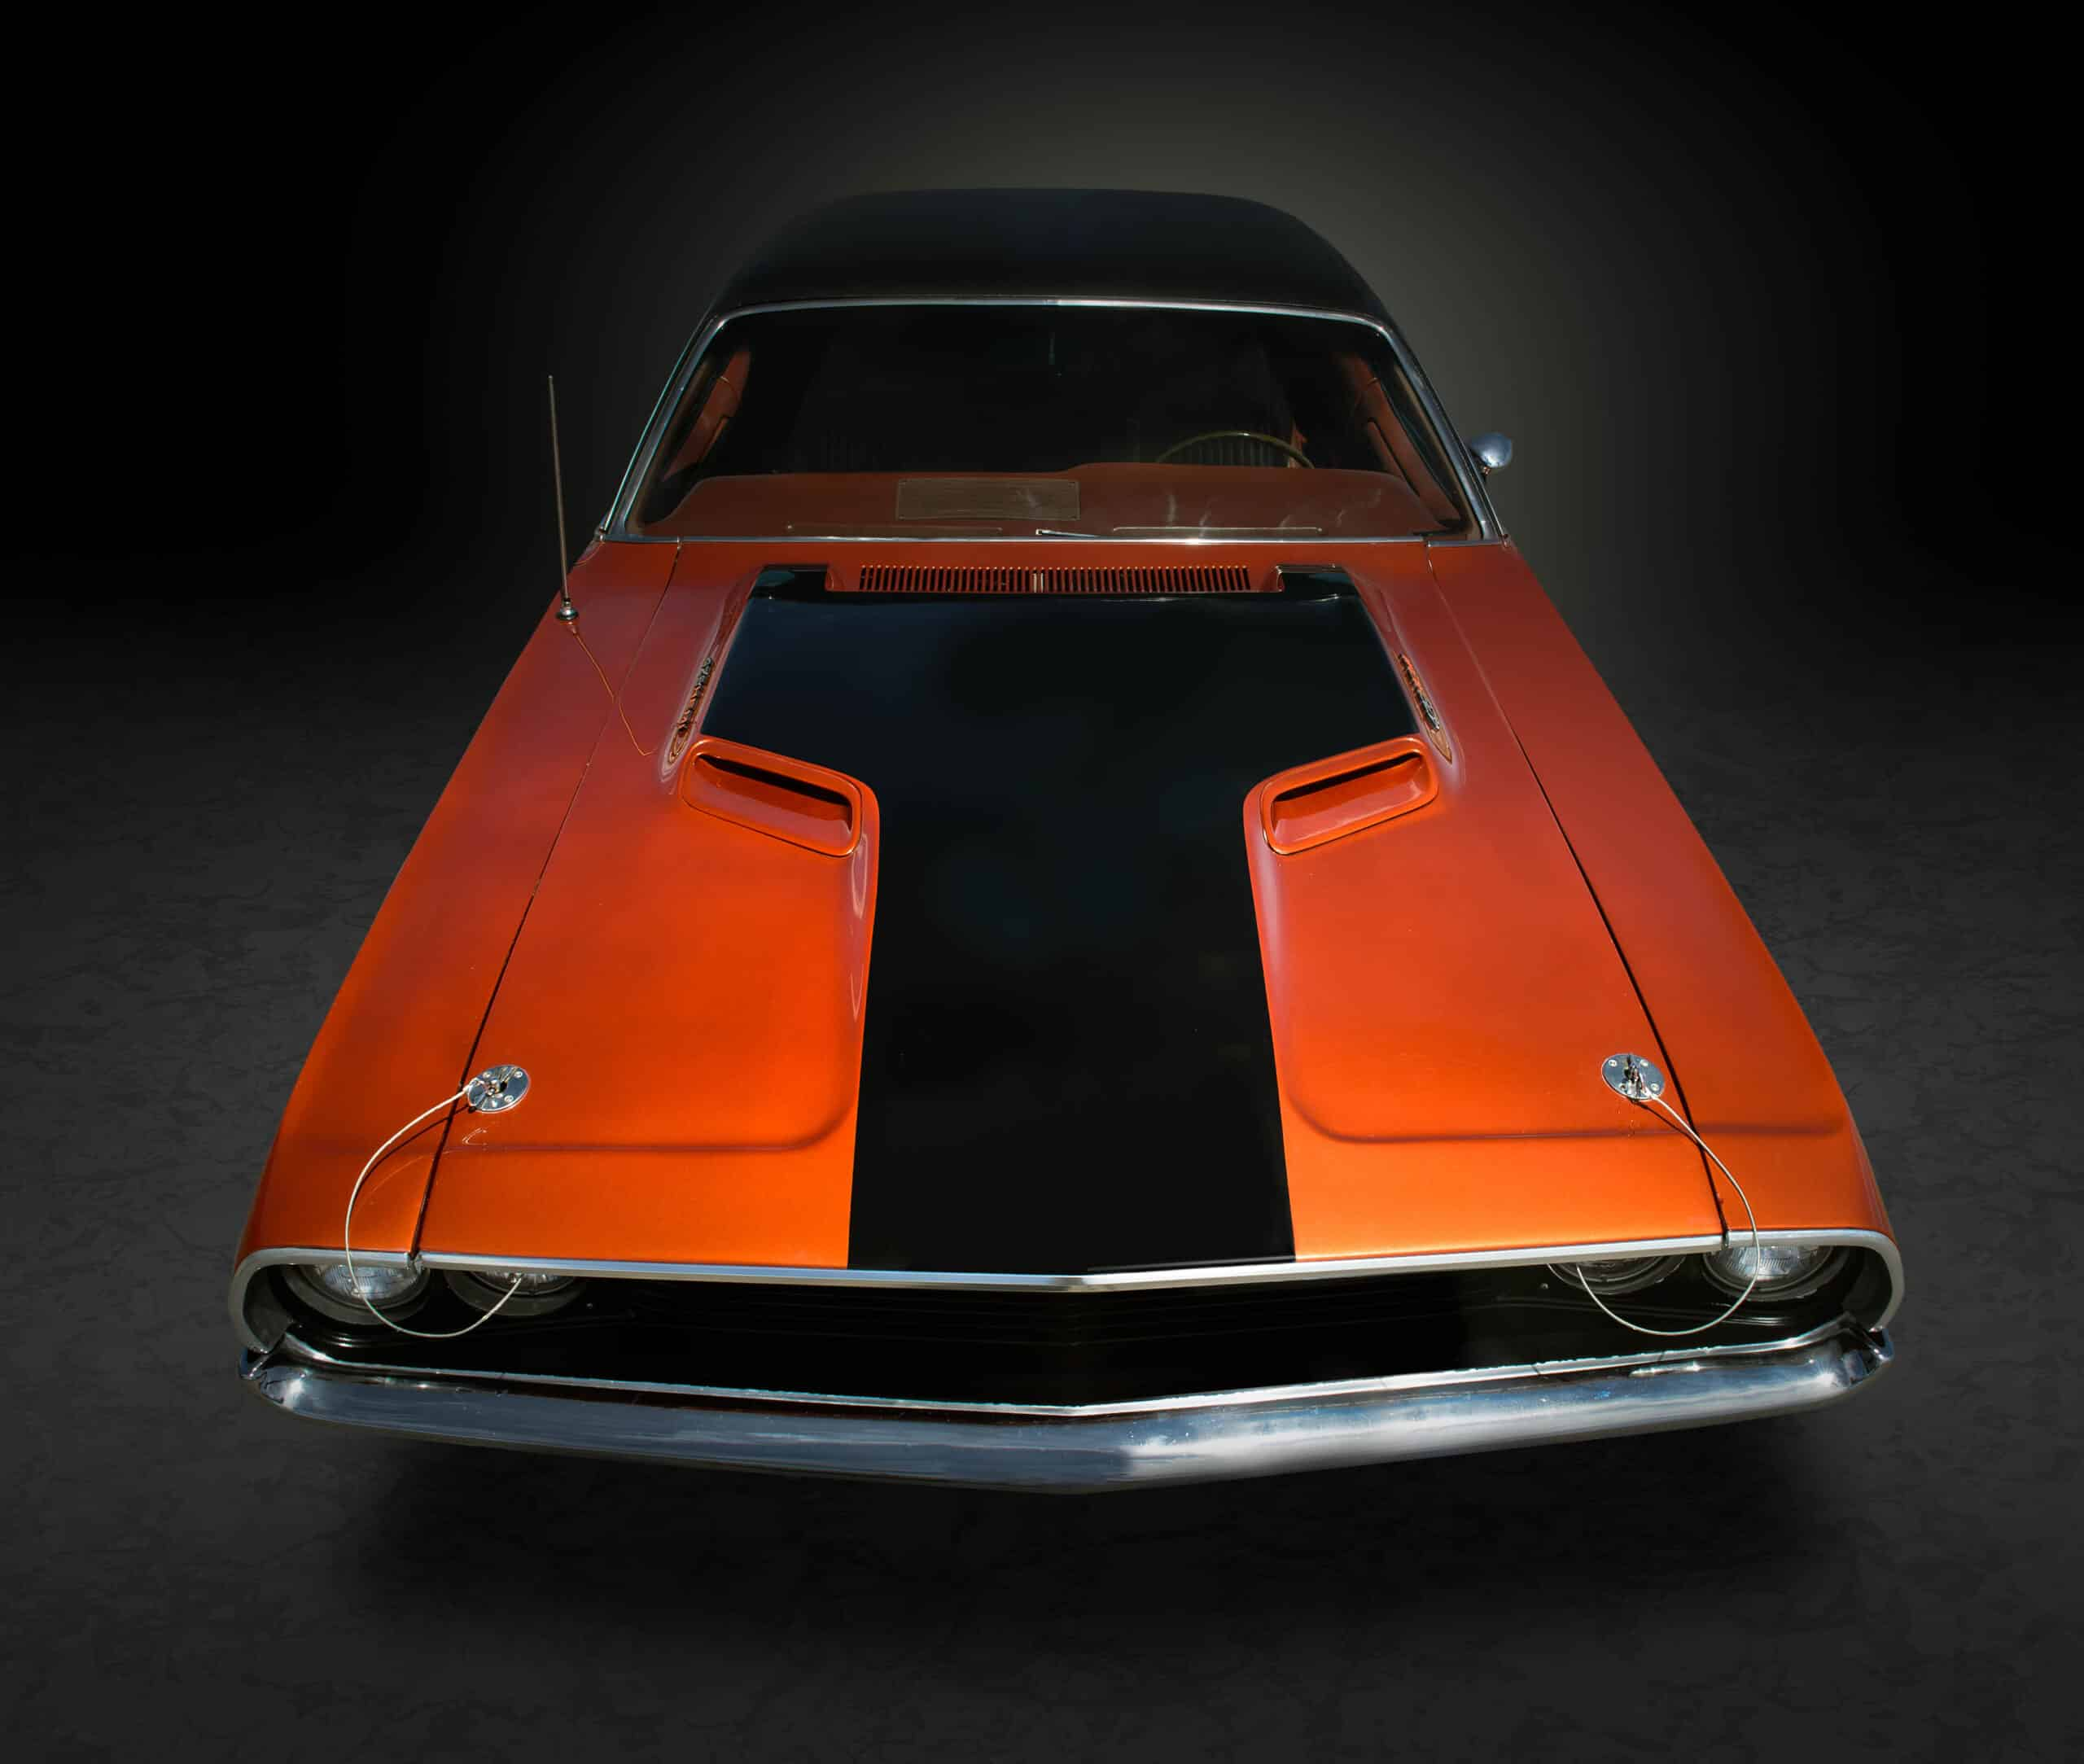 1970 Dodge Challenger R/T SE Hemi Article | William Horton Photography